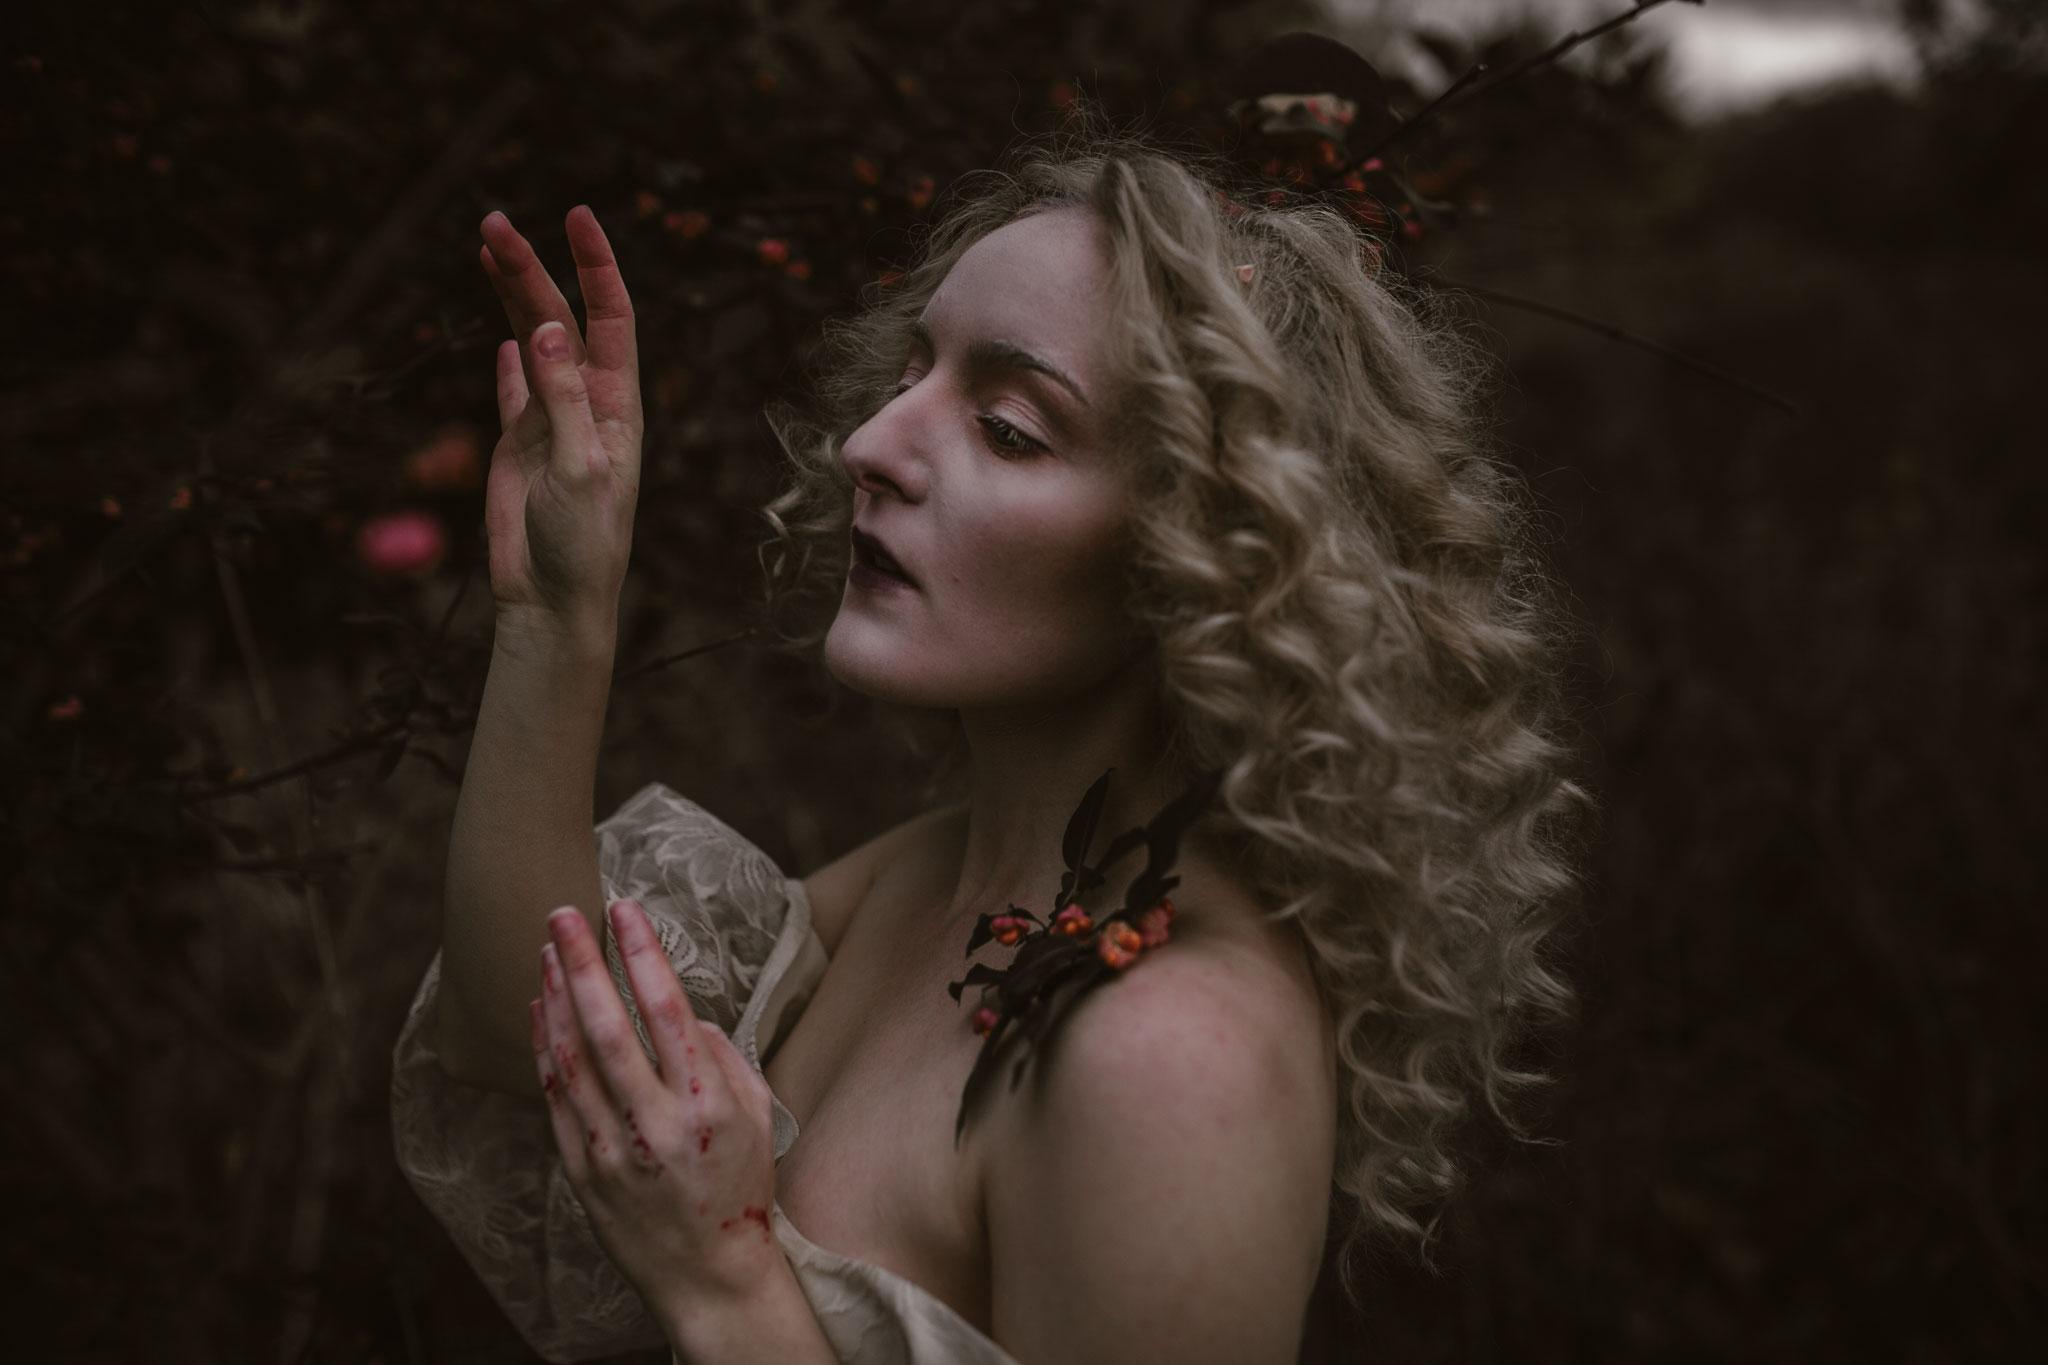 pale-witch-200fb.jpg